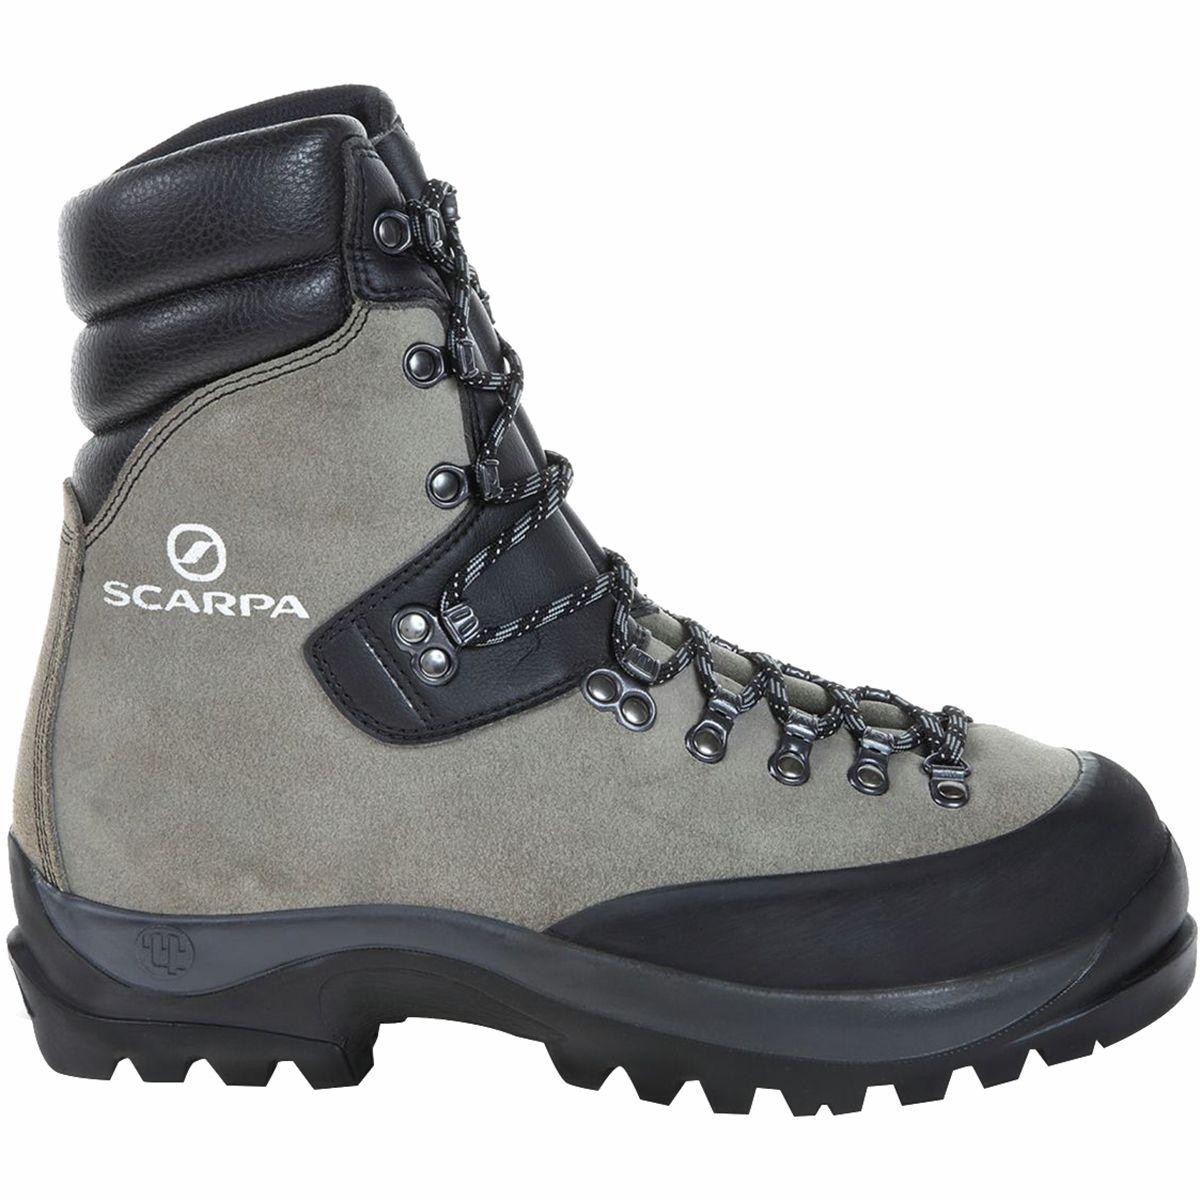 photo: Scarpa Wrangell GTX mountaineering boot